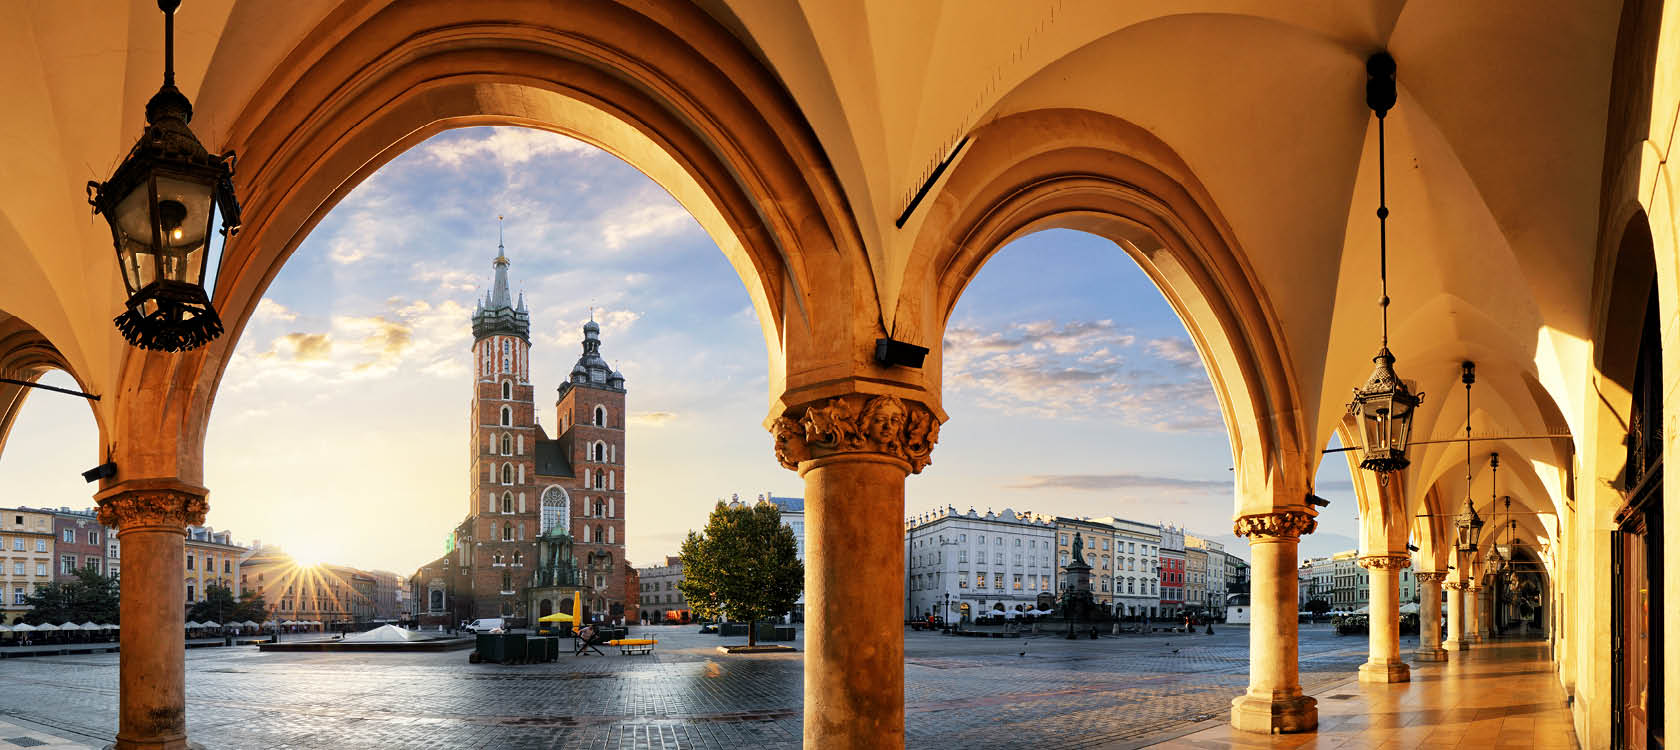 upplev krakow på en storstadsweekend